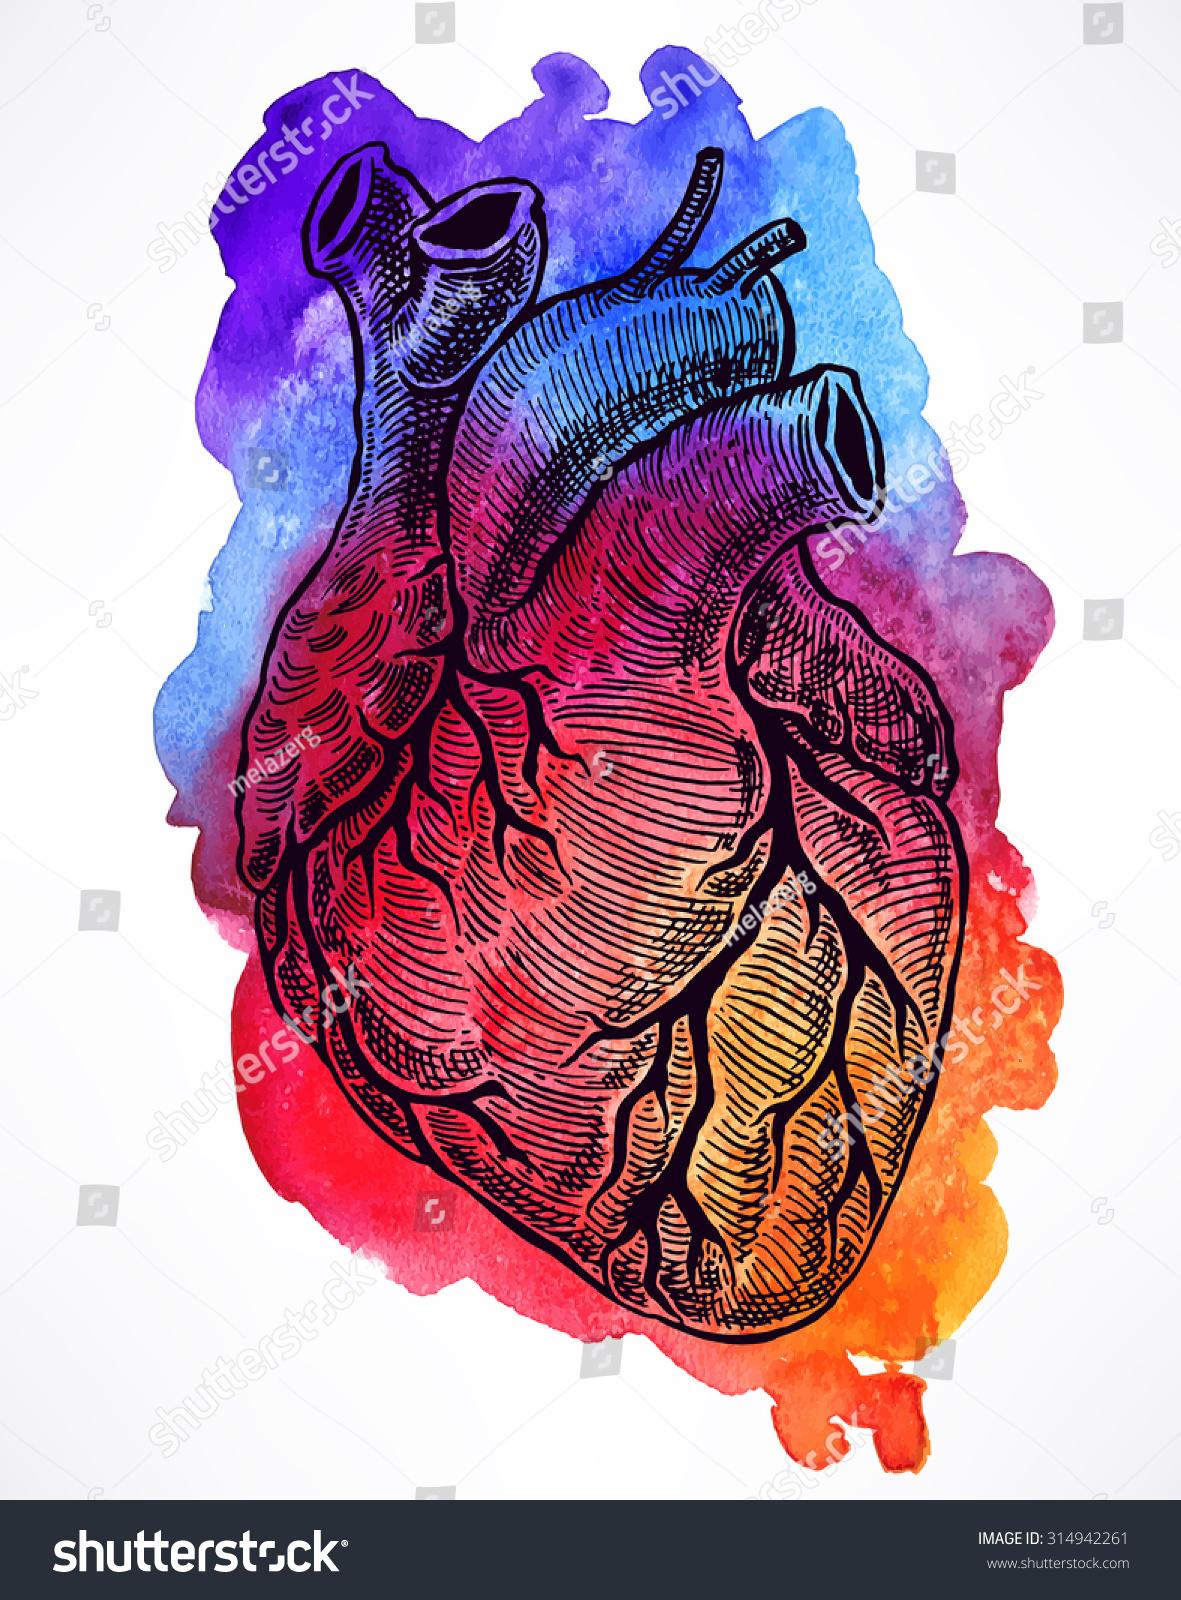 Sienna Morris - Wikipedia   Human Heart Art